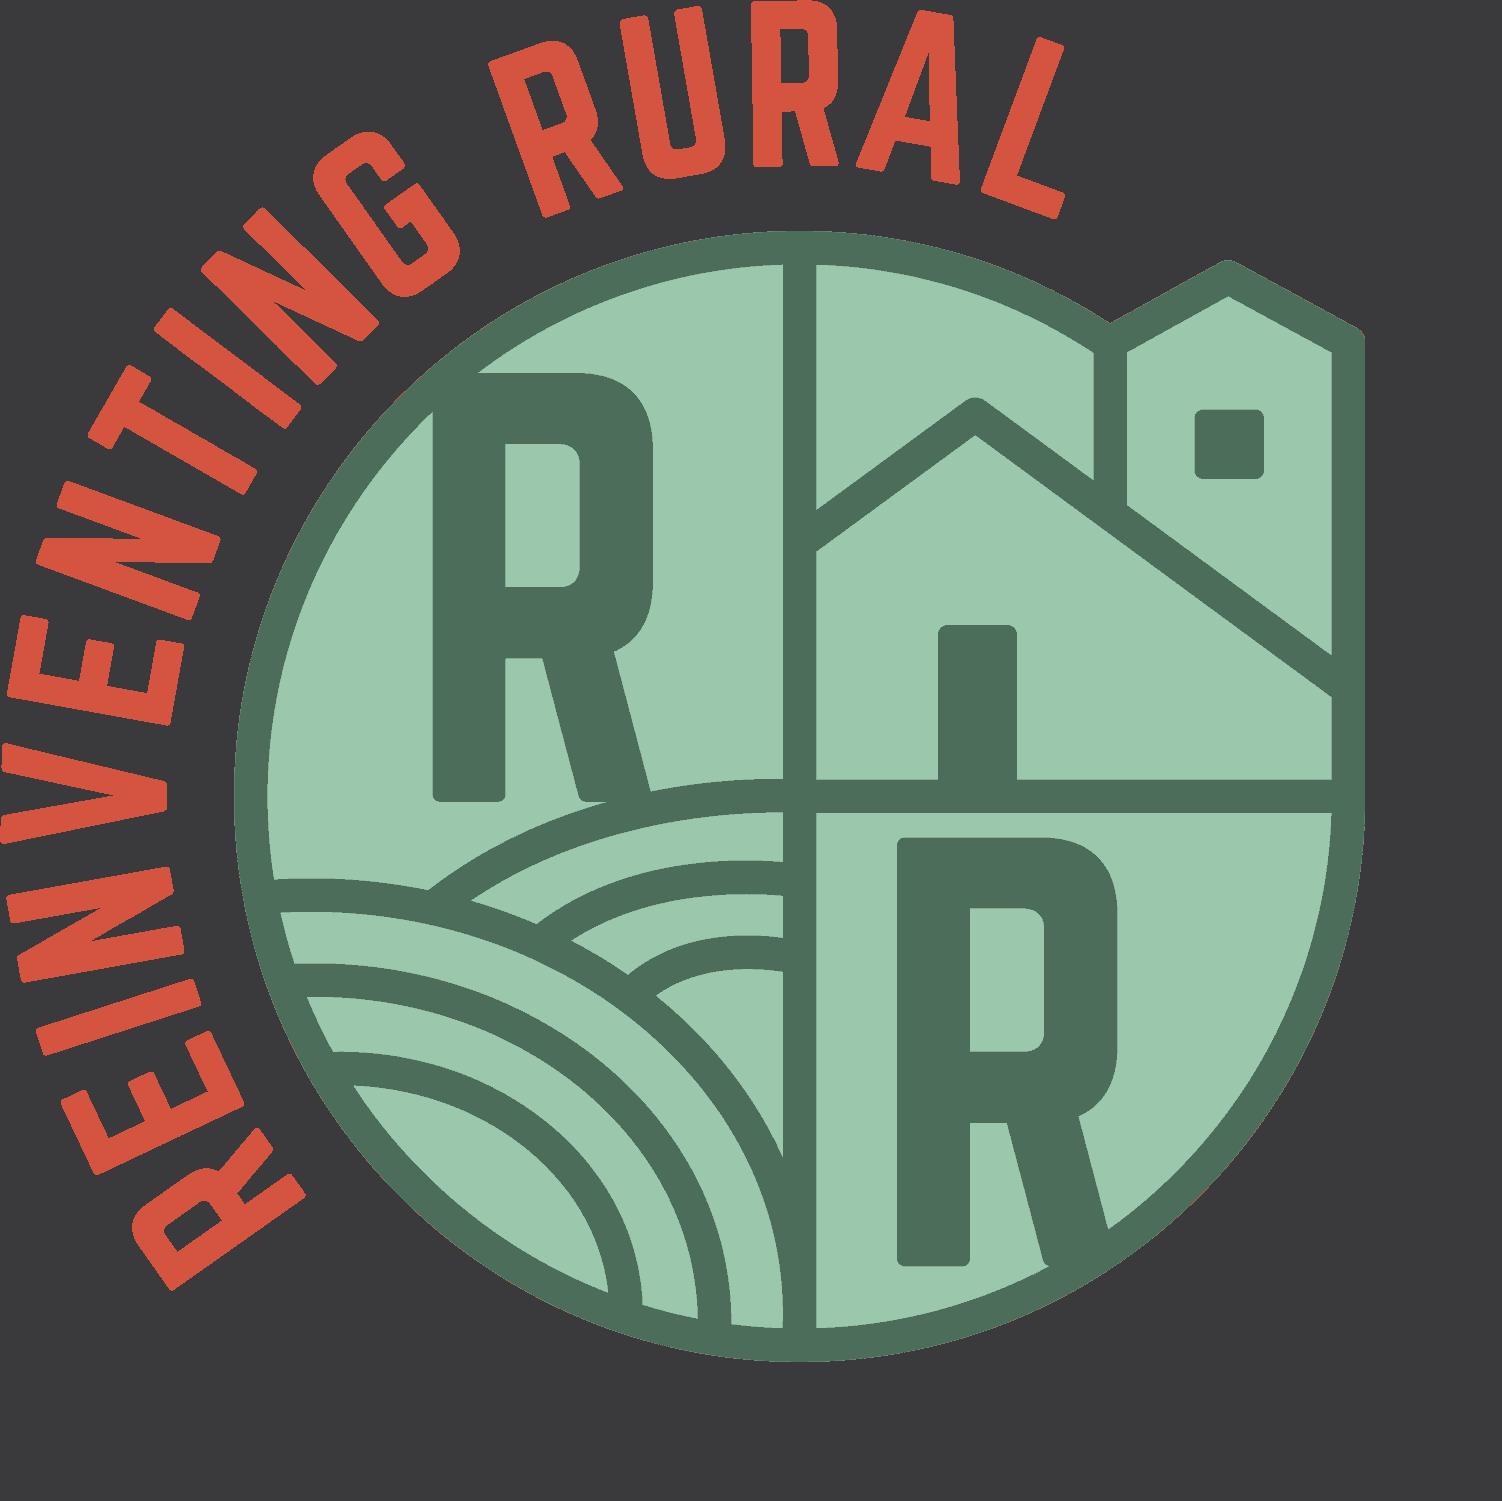 Reinventing Rural Circular Logo w URL